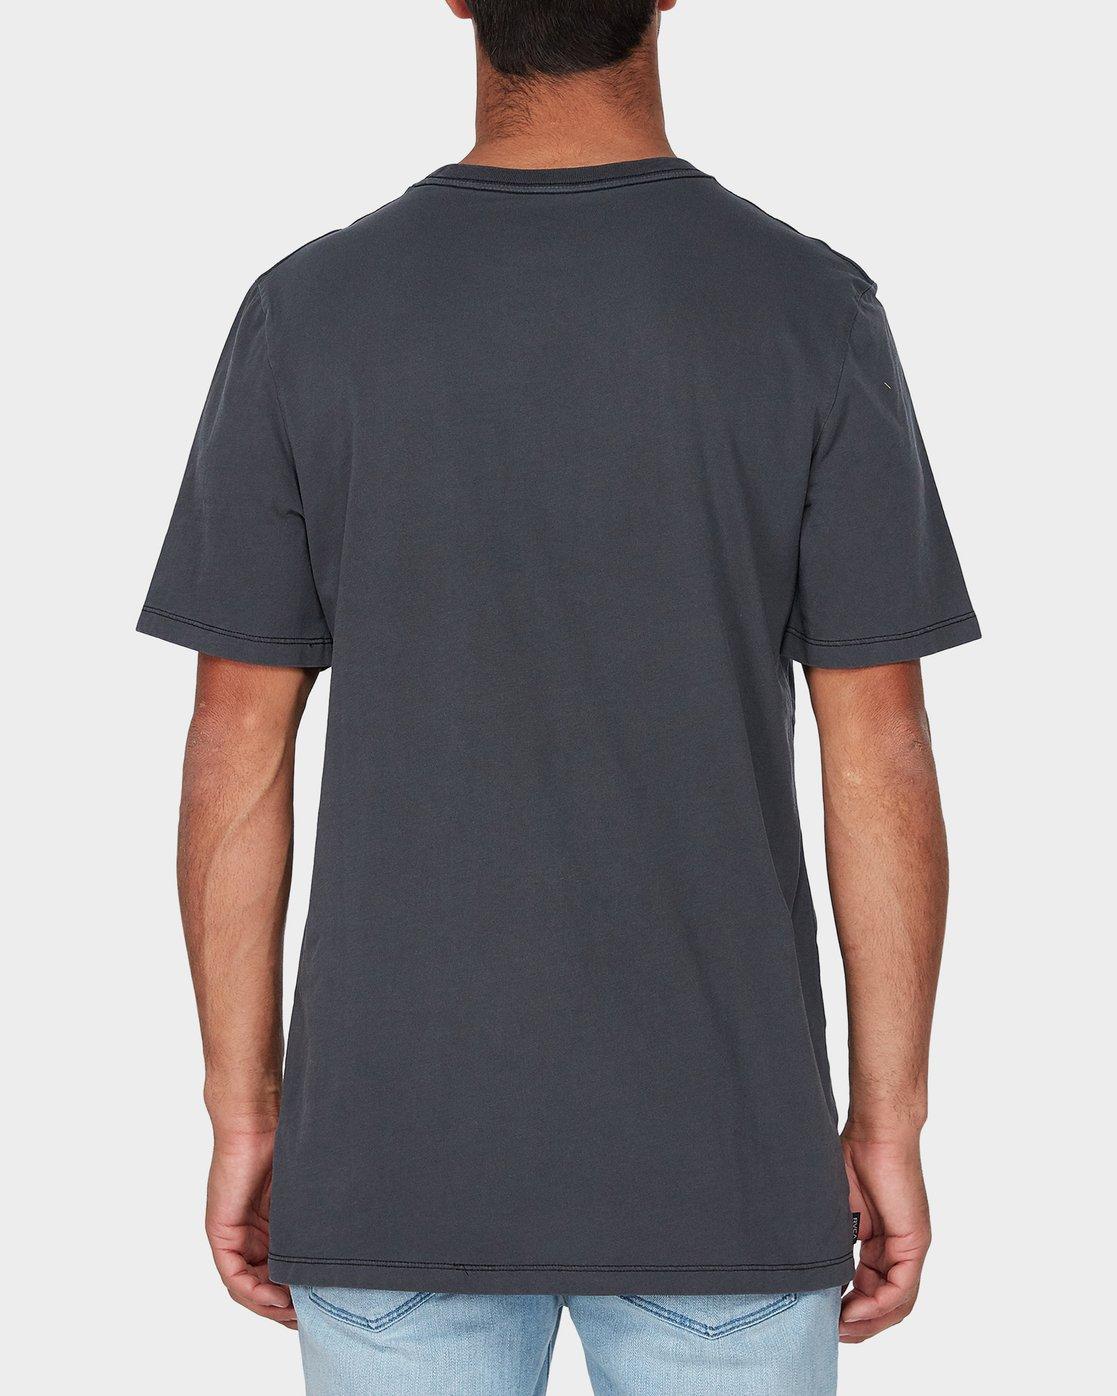 2 RVCA Samurai Short Sleeve T-Shirt  R193054 RVCA